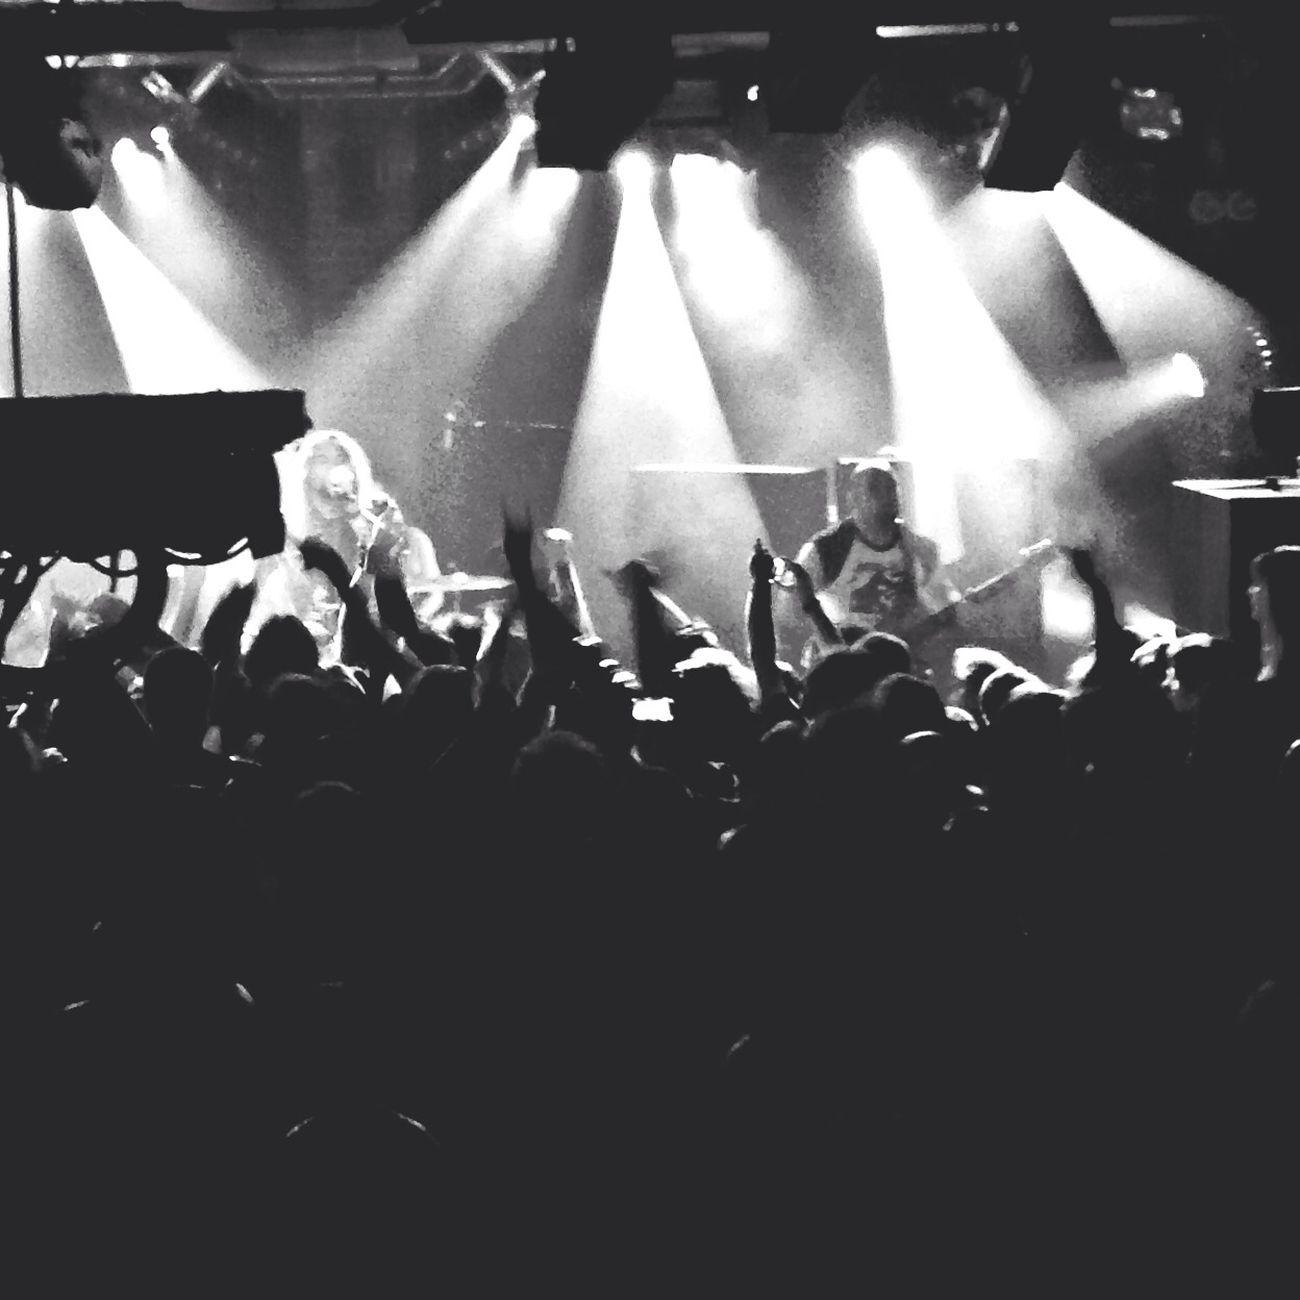 Soulfly Paris Concert Blackandwhite